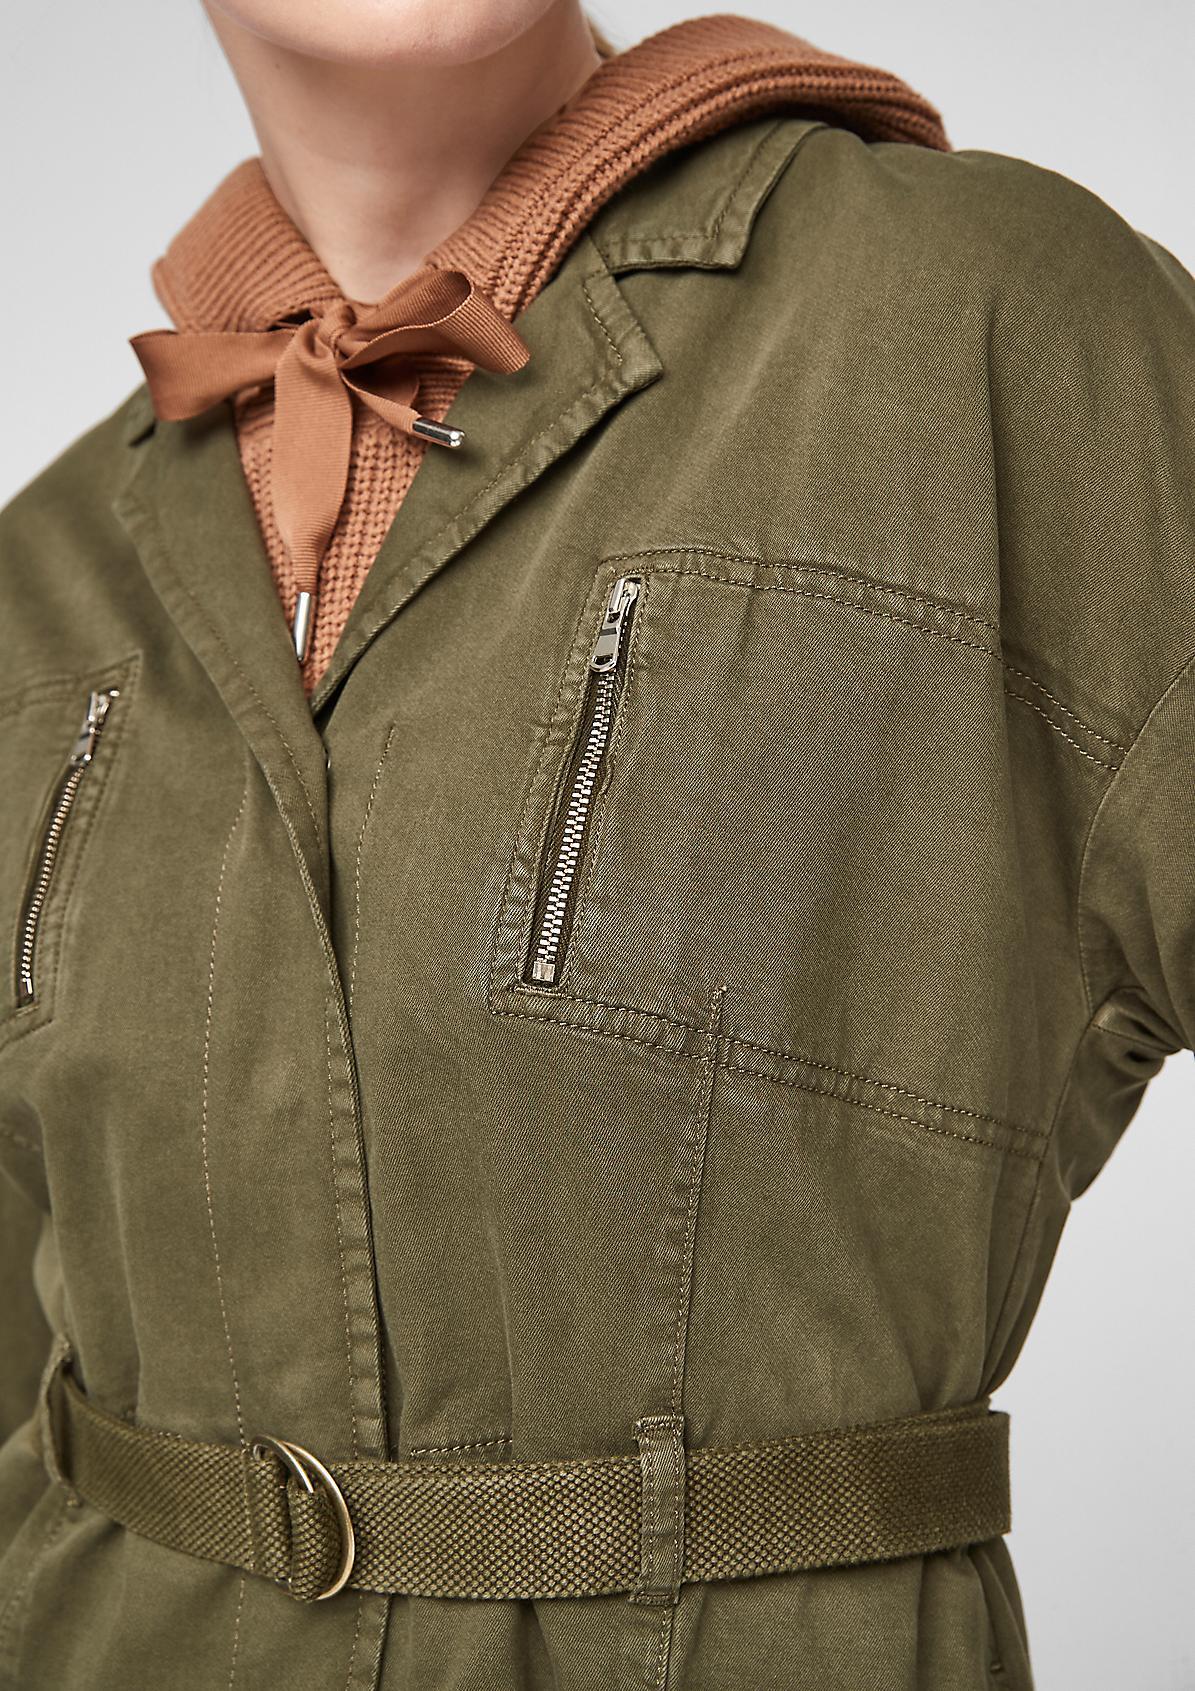 Lässige Jacke mit Gürtel